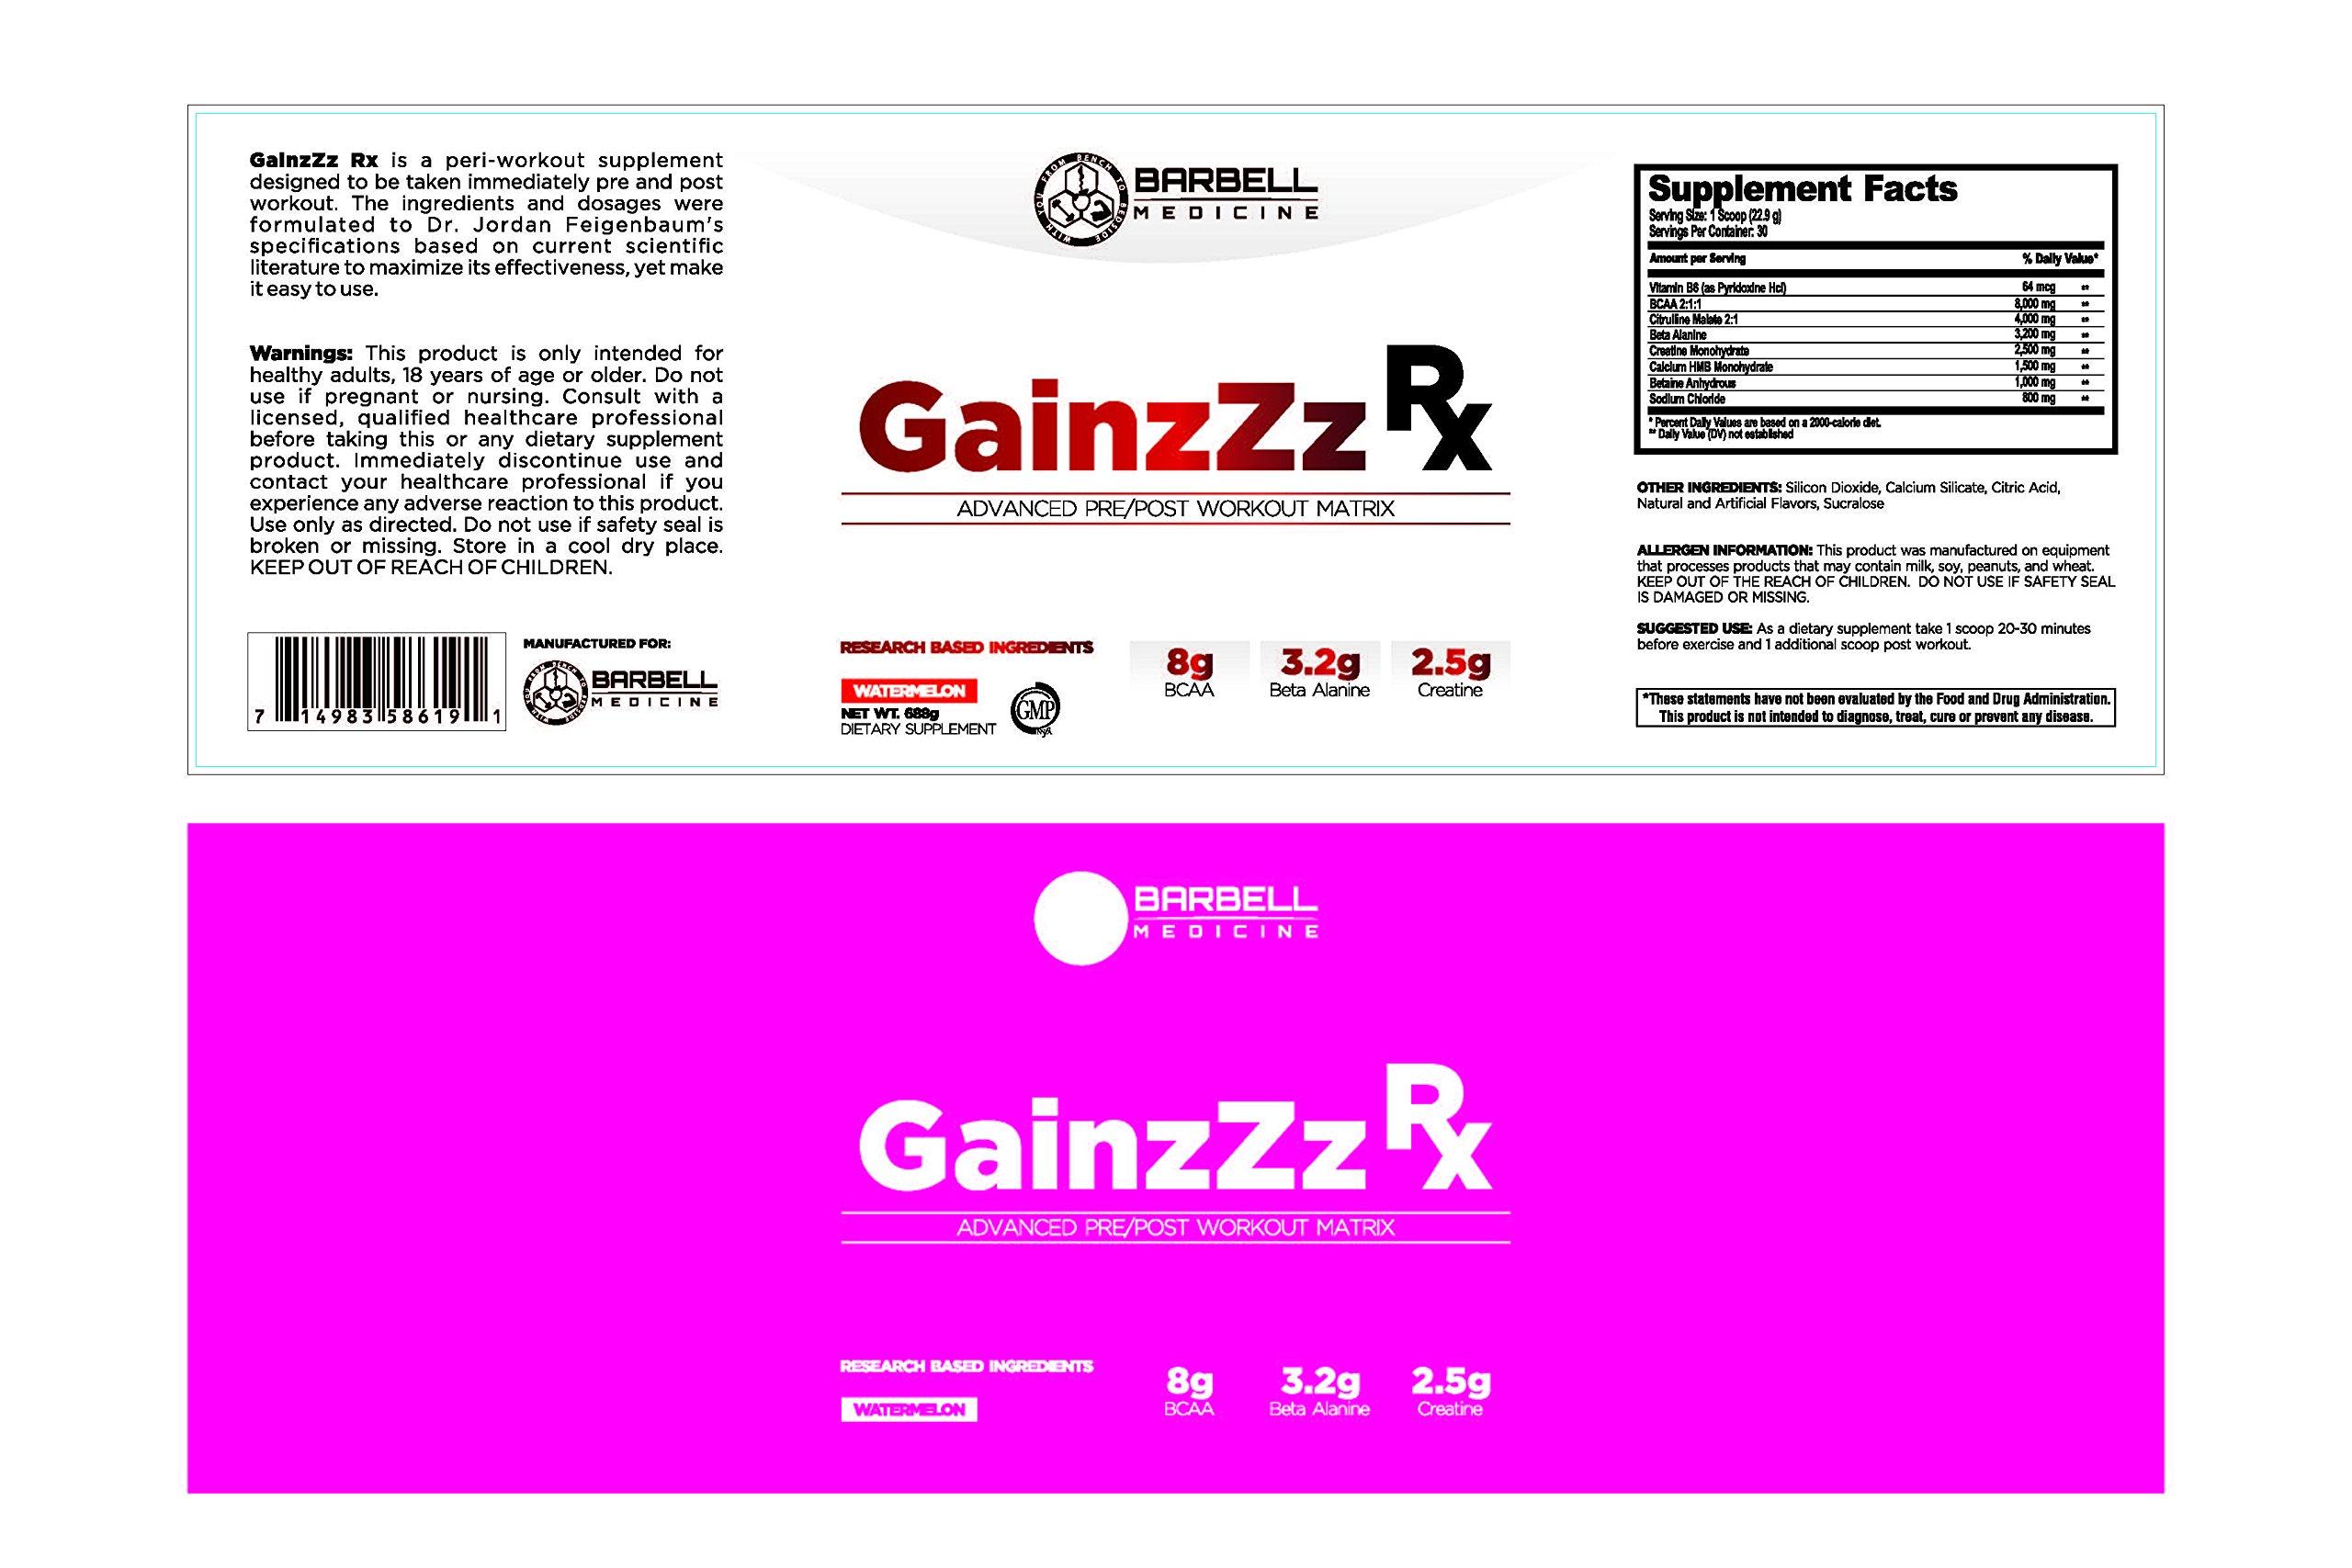 Barbell Medicine, Peri-Rx Post & Pre-Workout Powder, BCAA, Creatine Monohydrate, Beta Alanine, Citrulline Malate, HMB, Betaine Anhydrous, Caffeine Free, Watermelon, 687g by GainzZz Rx (Image #2)